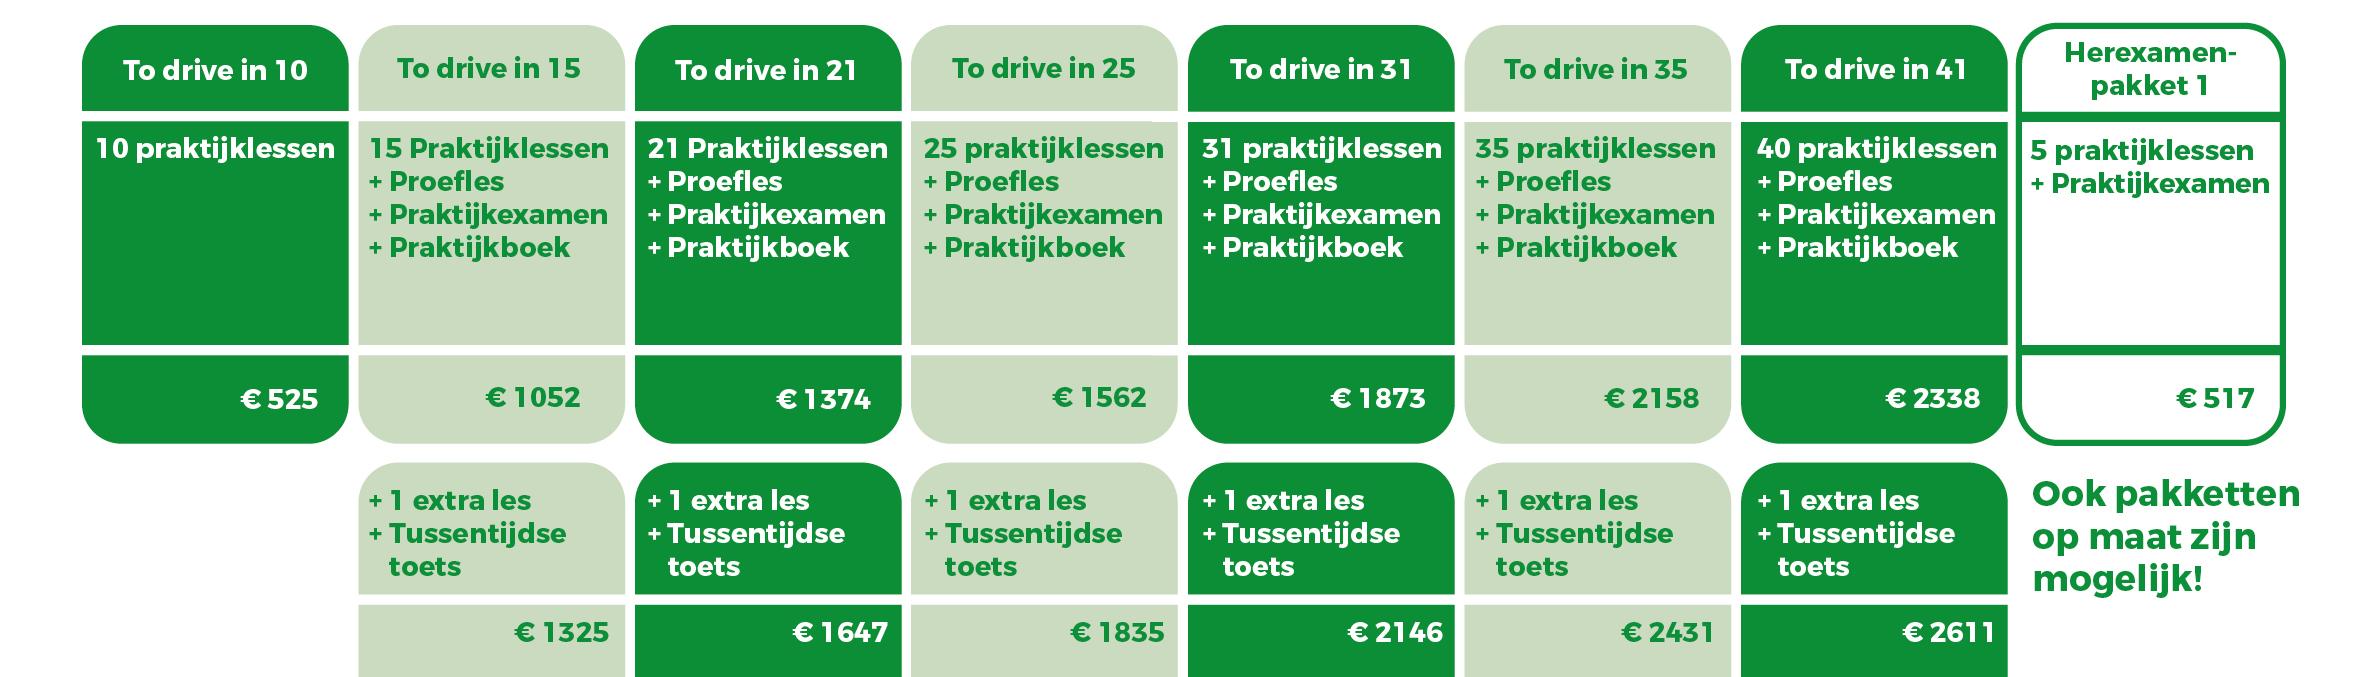 Autorijschool Ed To Drive - ETD_Header_prijzen_+1xtra_2021_V3.jpg